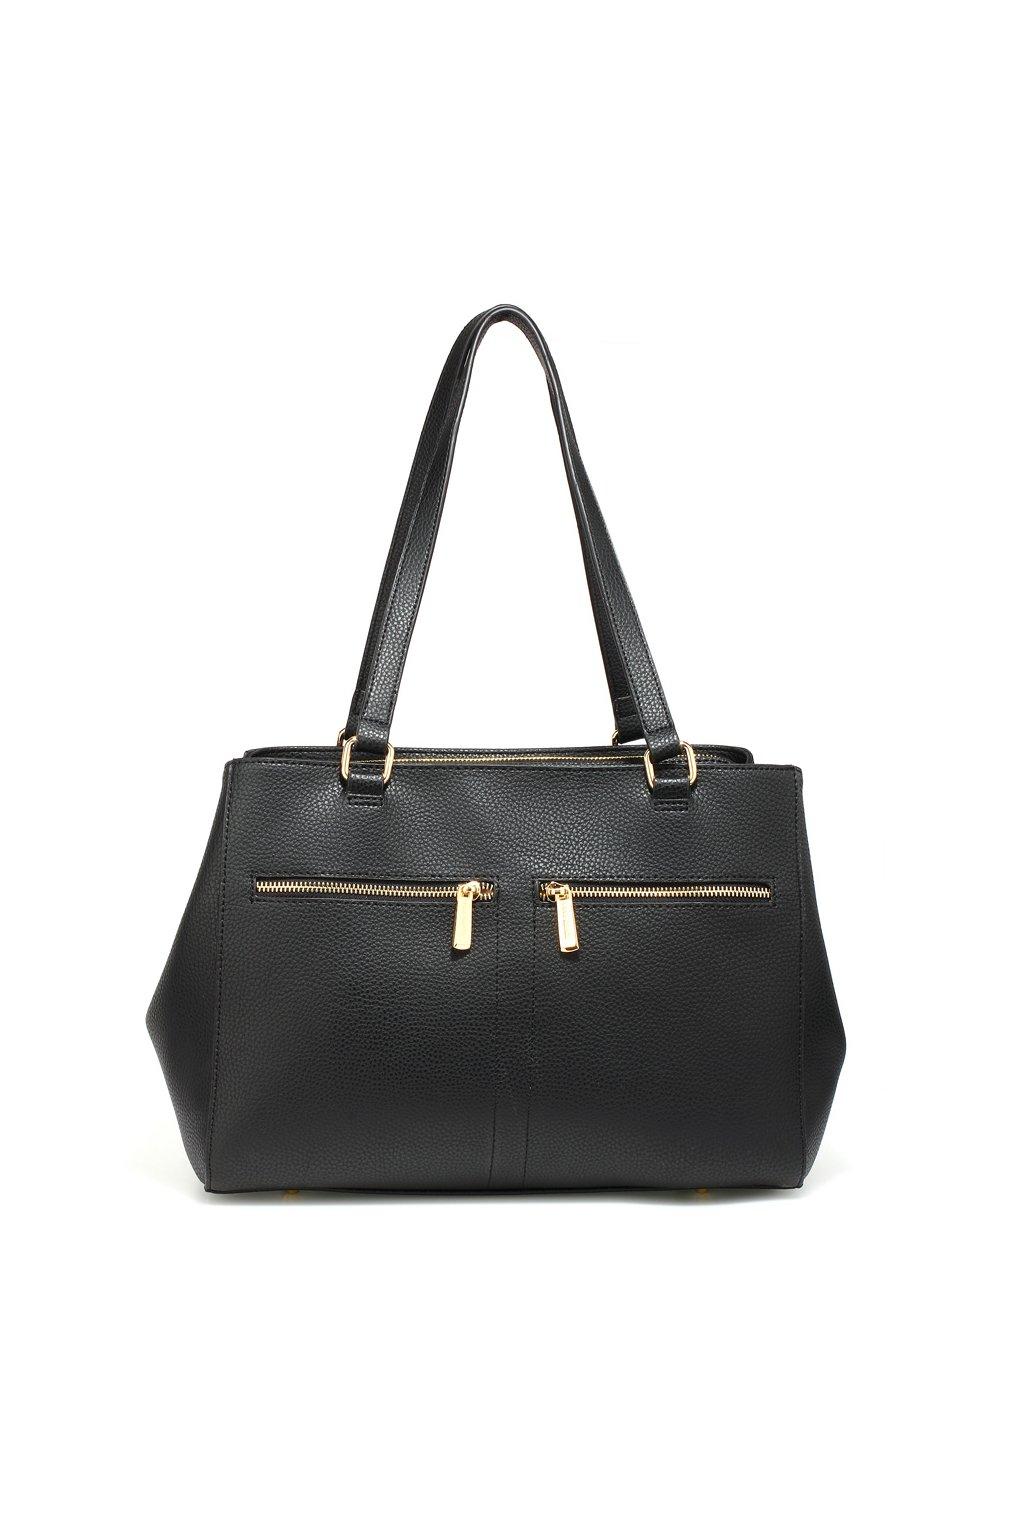 Čierna kabelka na rameno Amelia AG00526